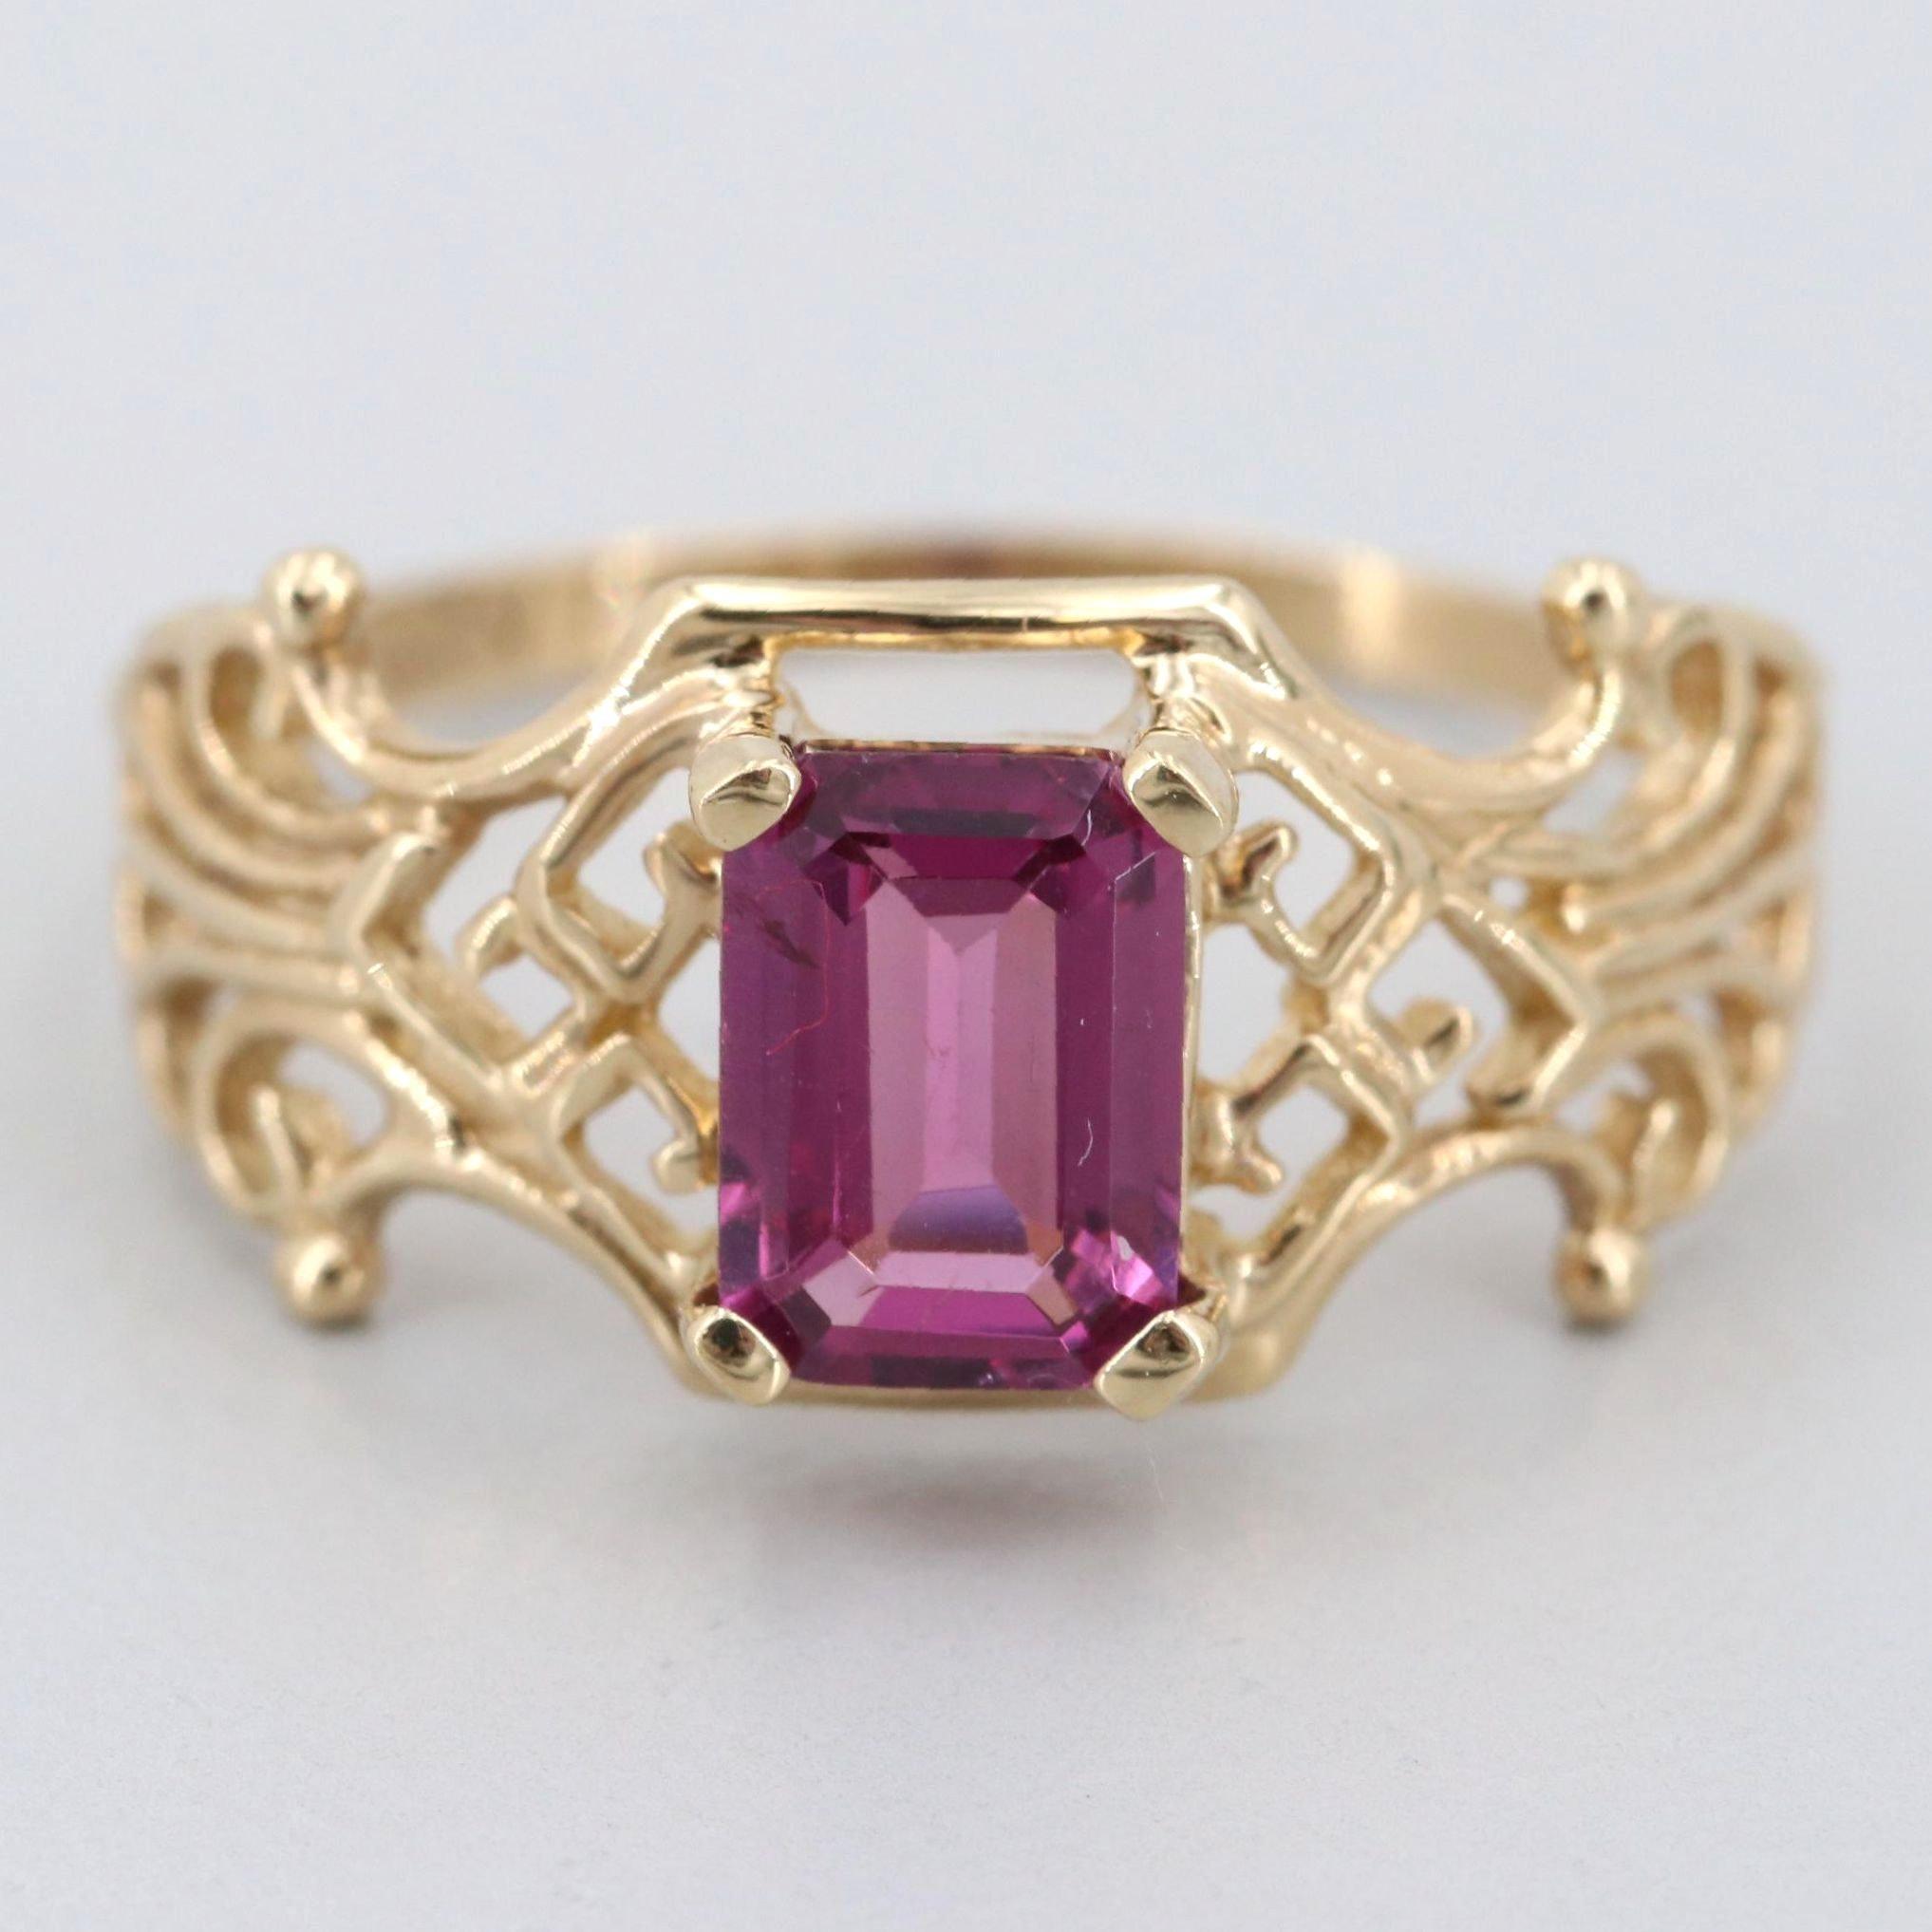 10K Yellow Gold Rhodolite Garnet Ring